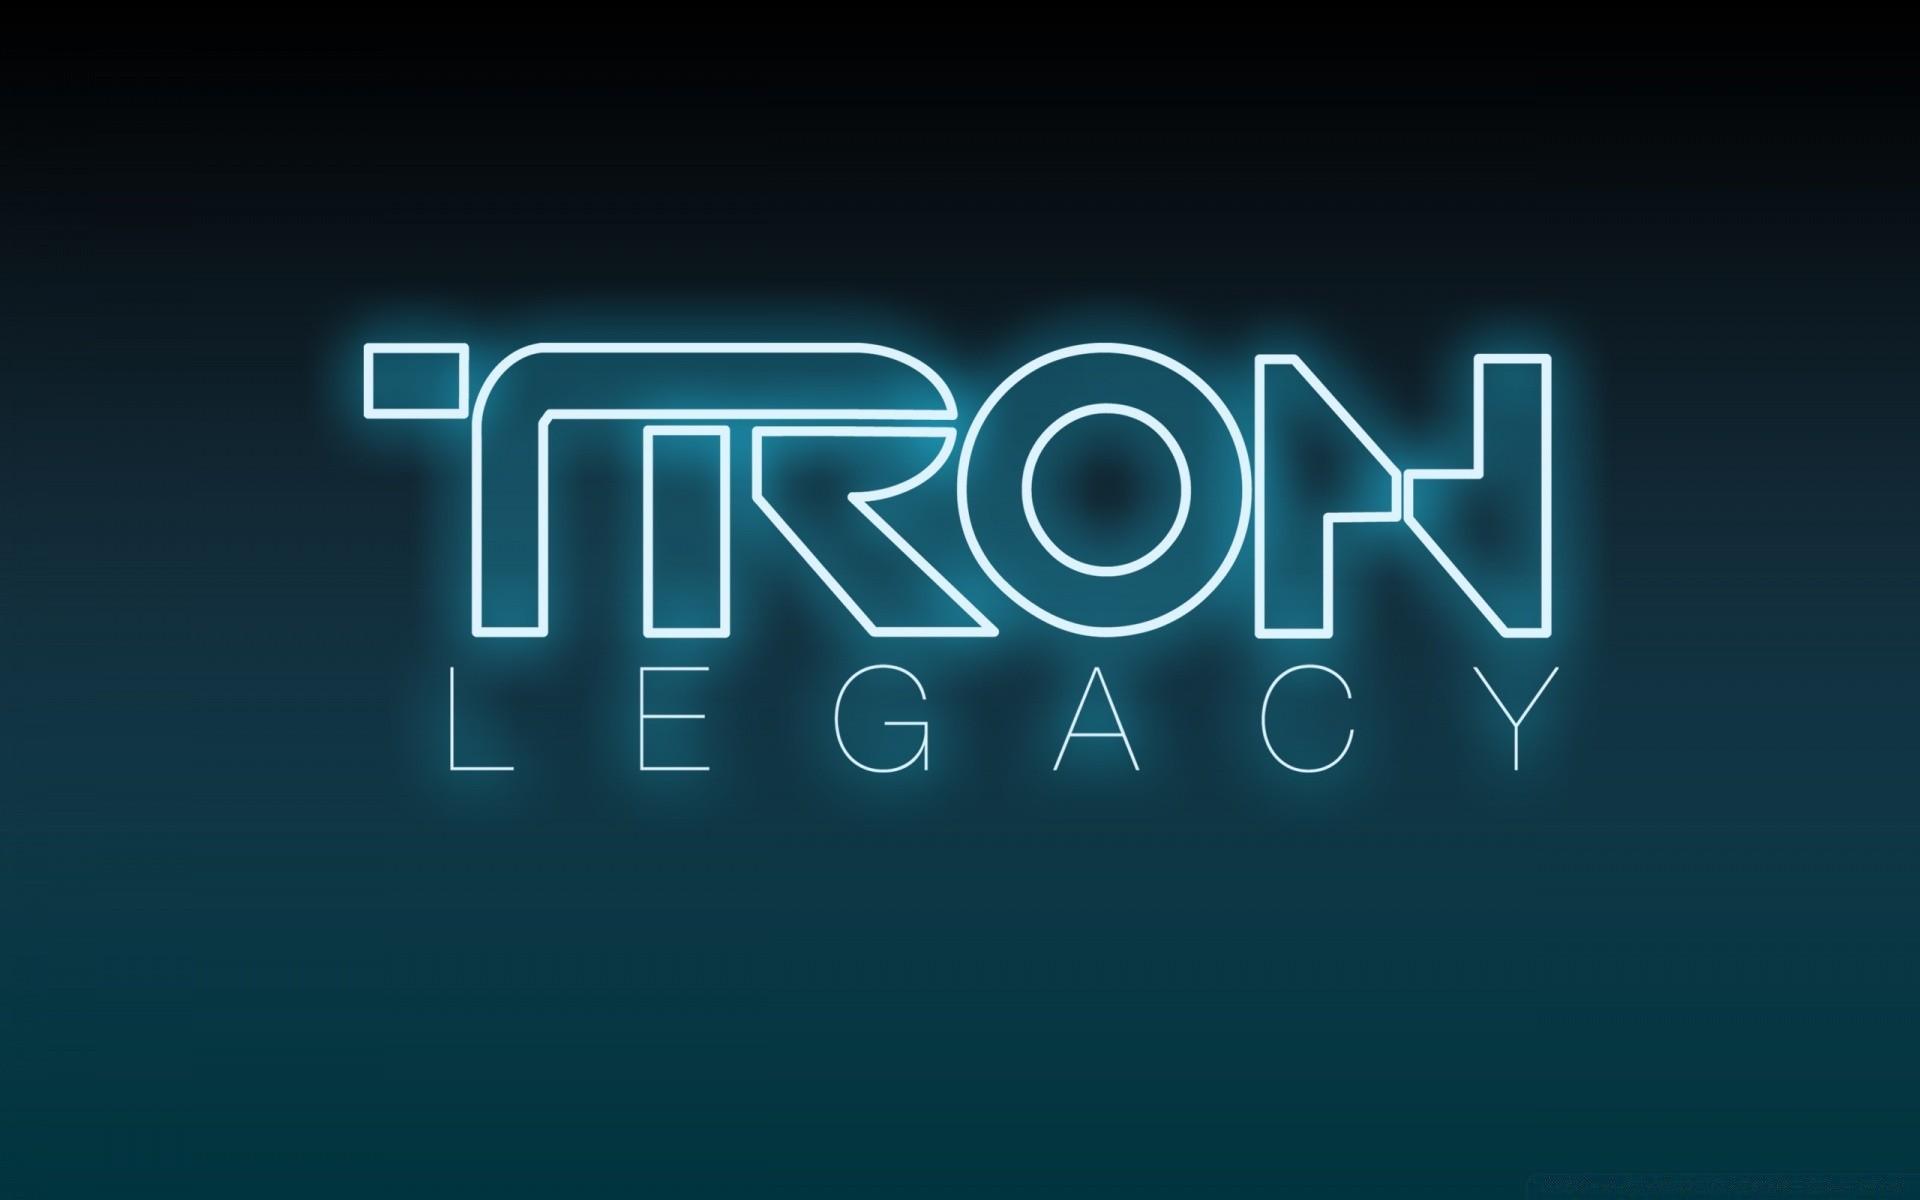 Tron Legacy Logo Free Wallpapers